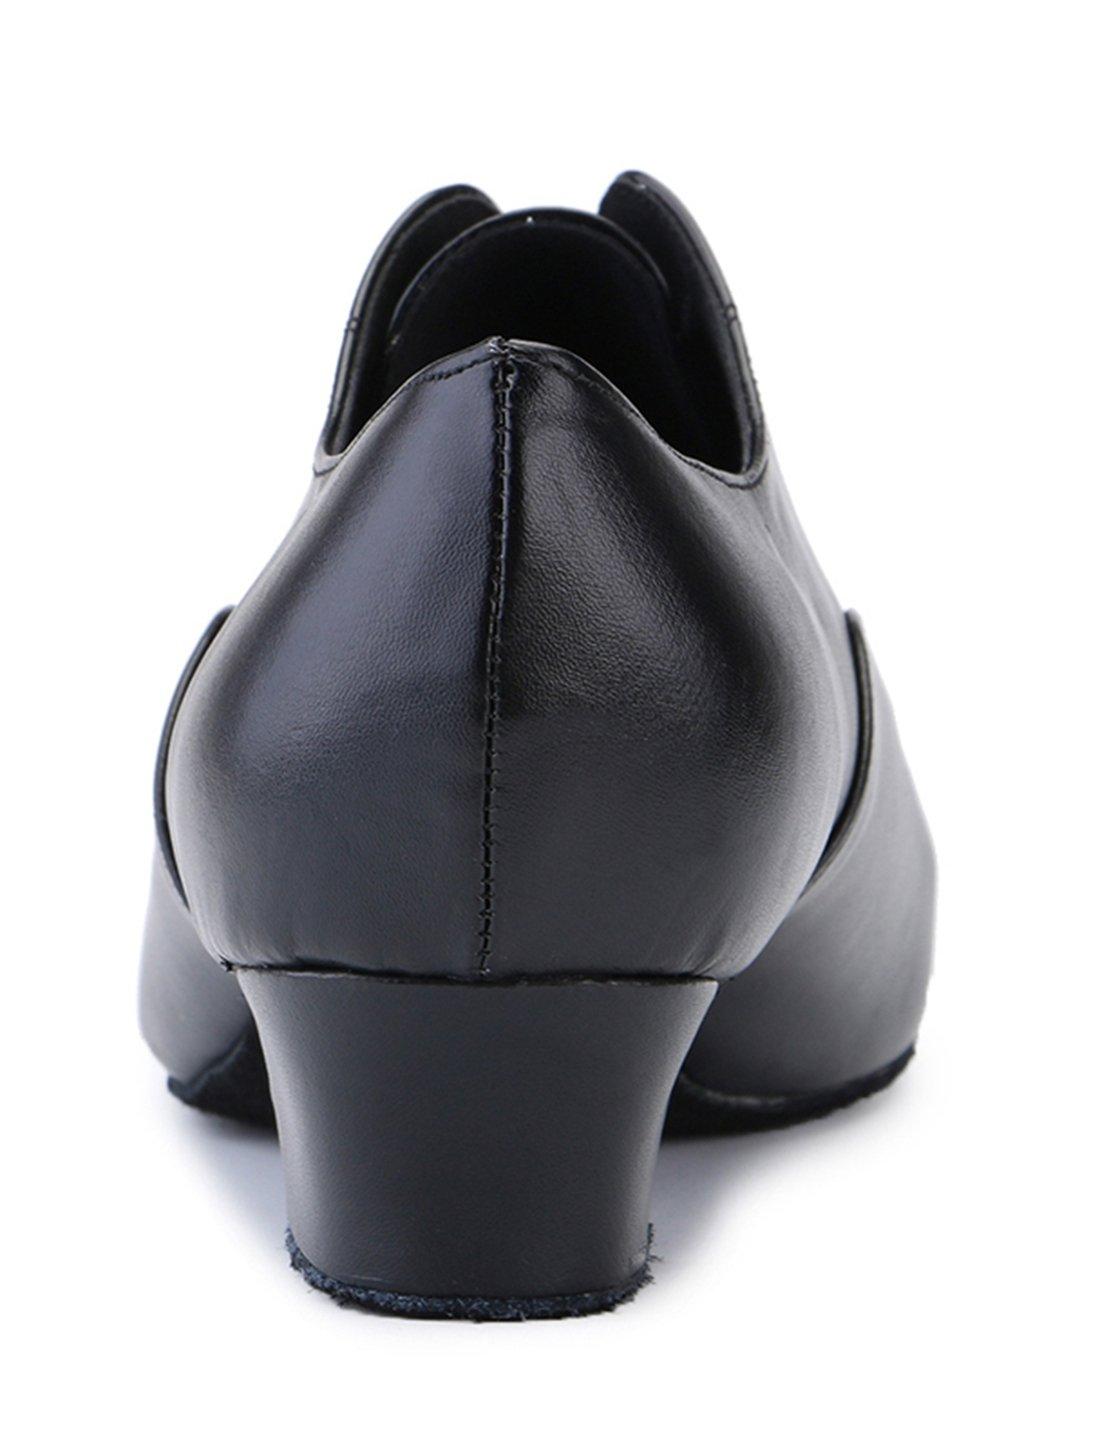 8429f2b3d TDA Zapatos clásicos de cuero con cordones para hombre Zapatos de boda de  baile latina Tacón negro-4.5cm